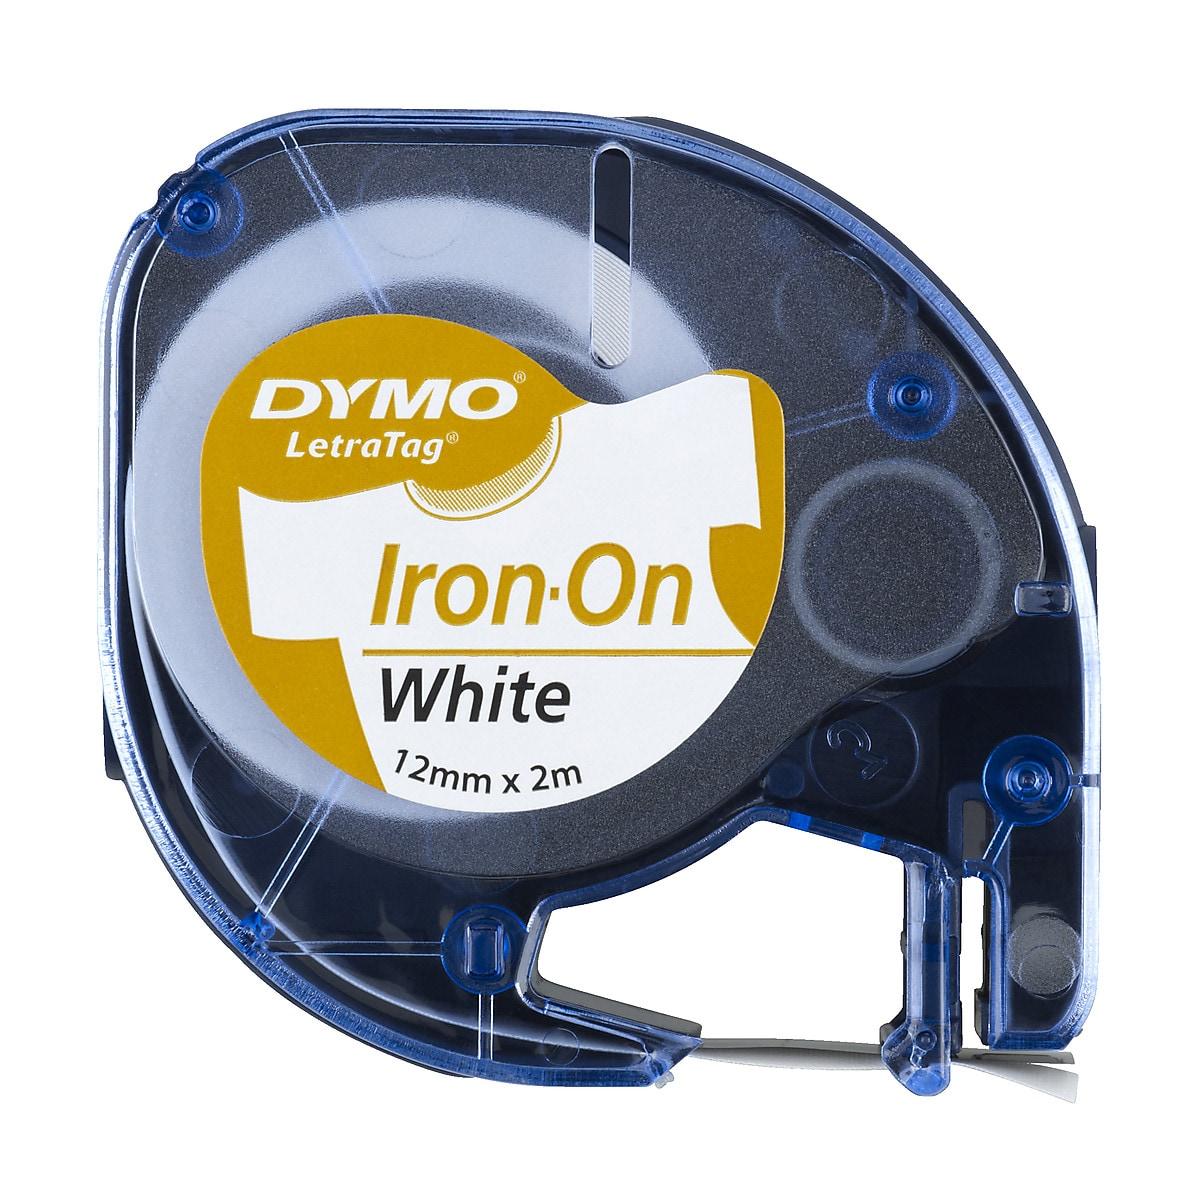 Märkband tygetiketter Dymo LetraTag Iron-on